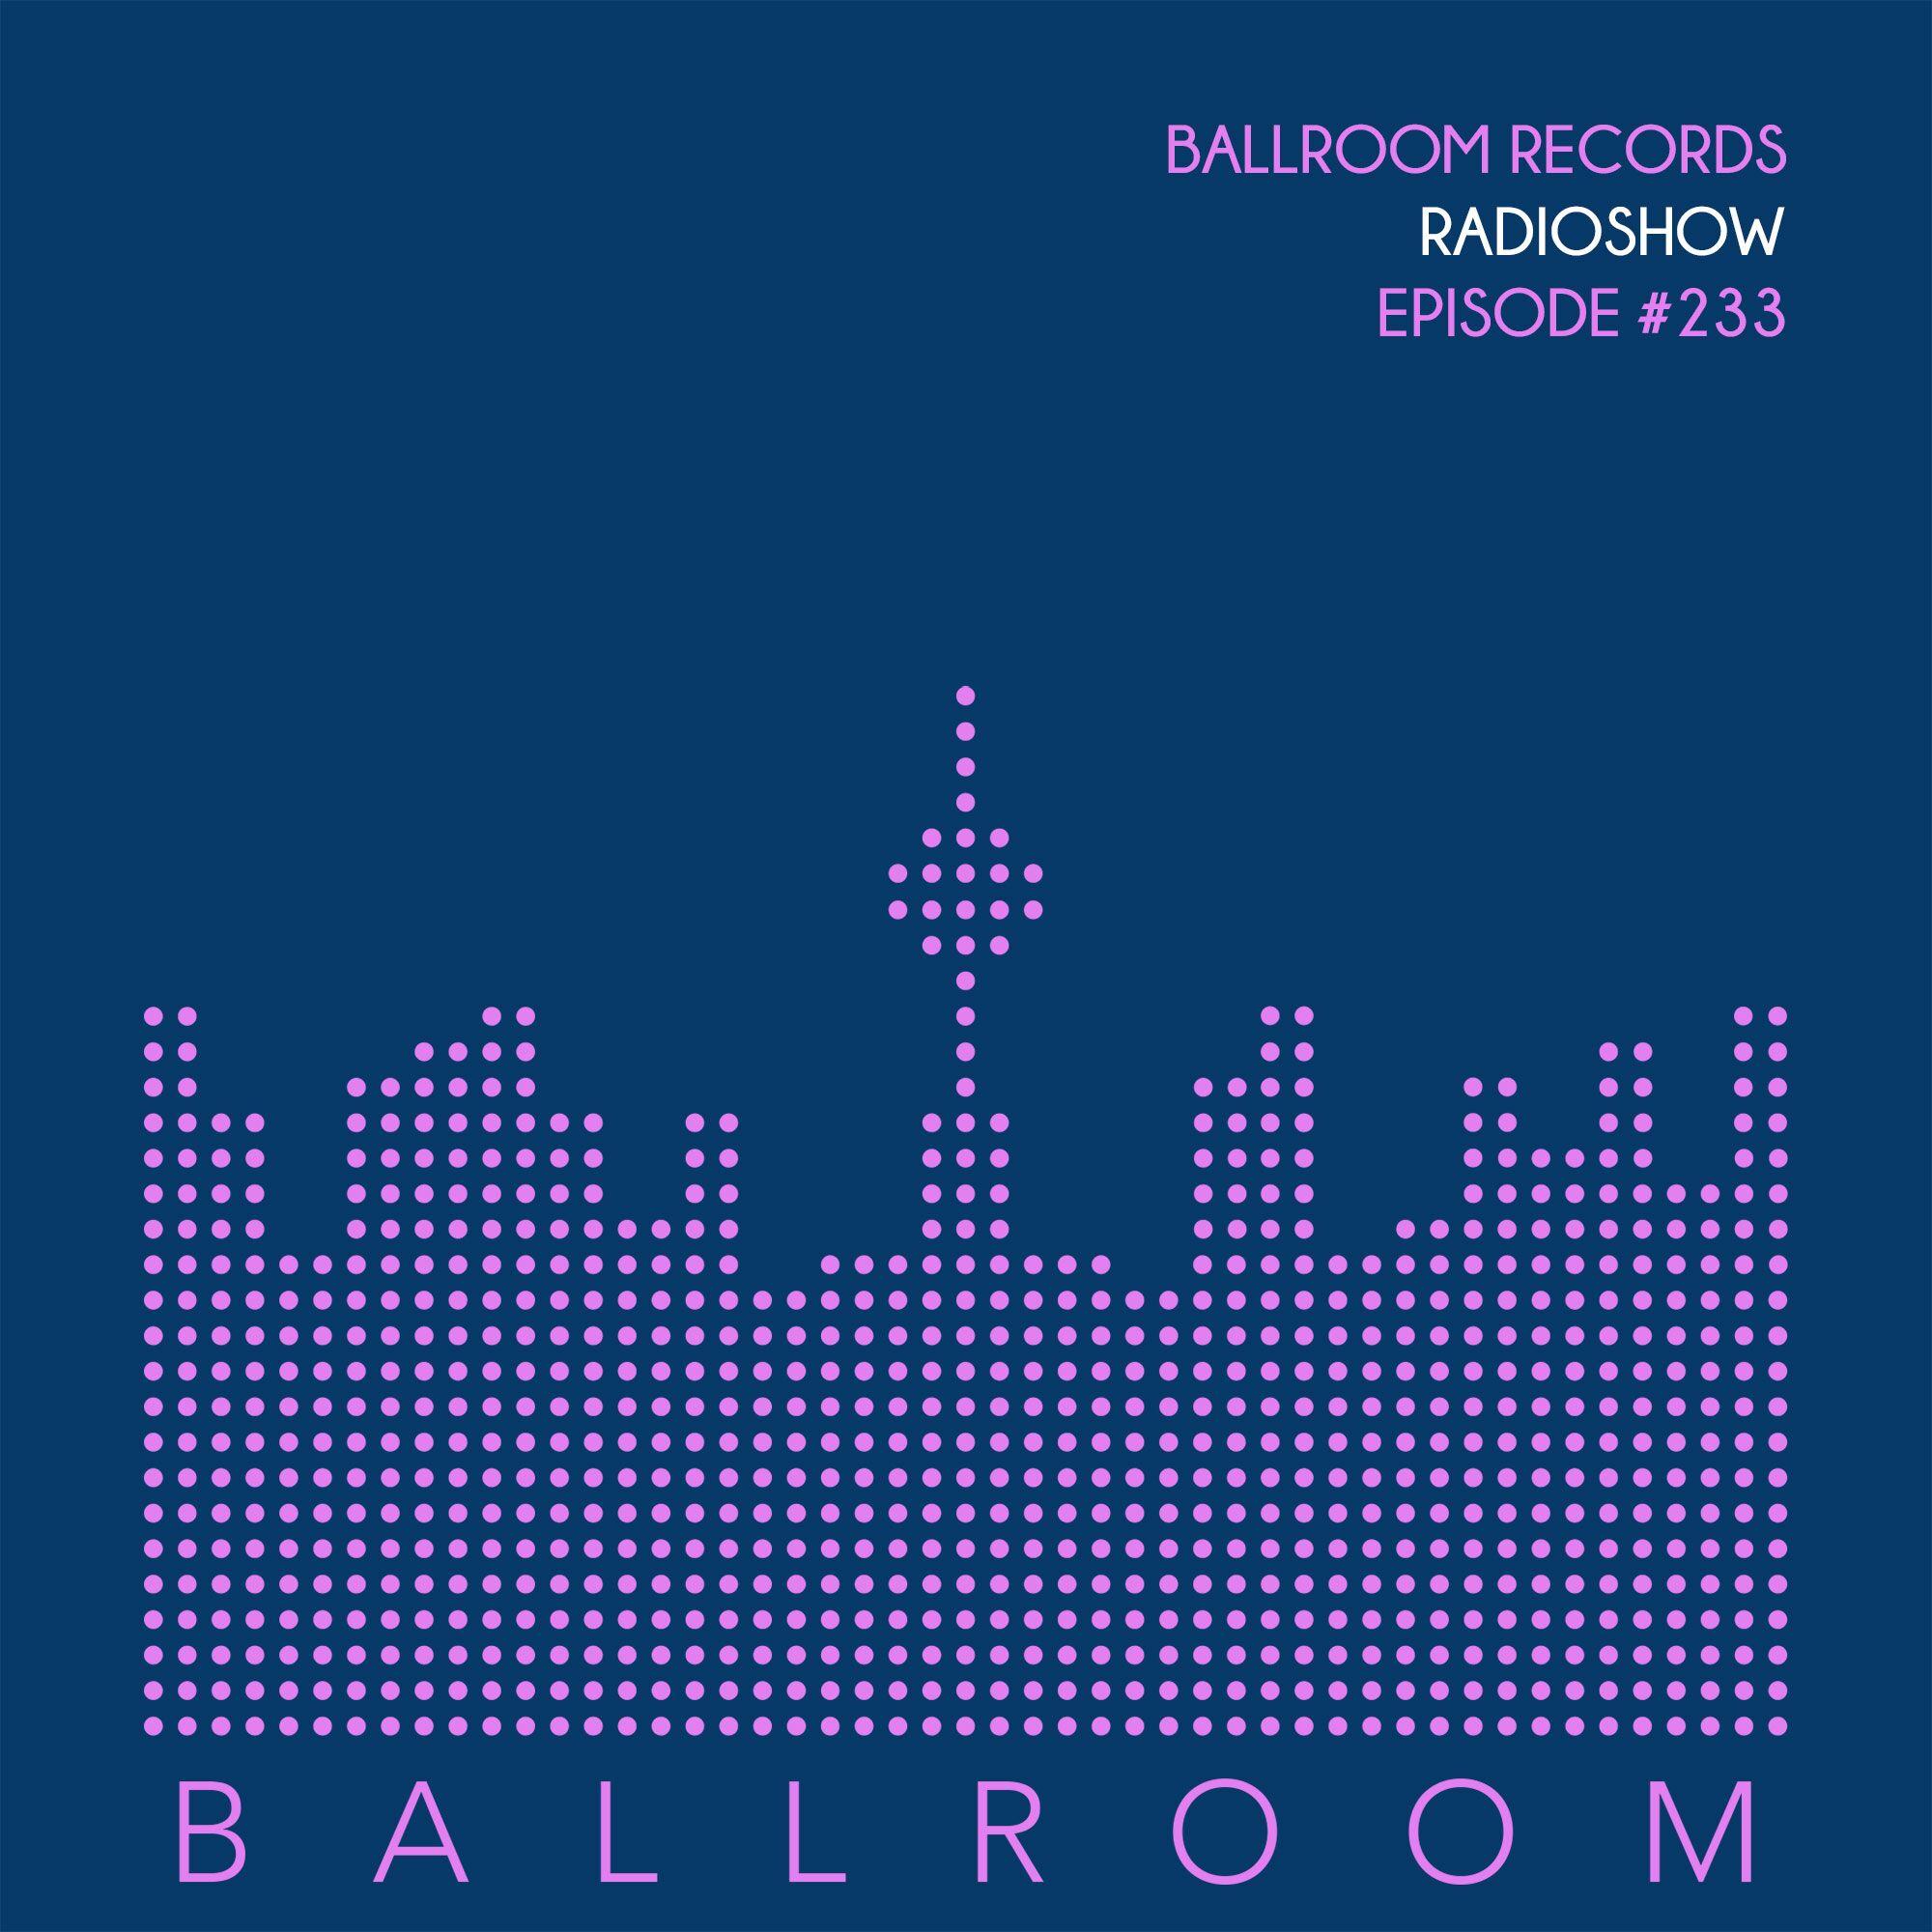 Albird — Ballroom Records Radioshow #233